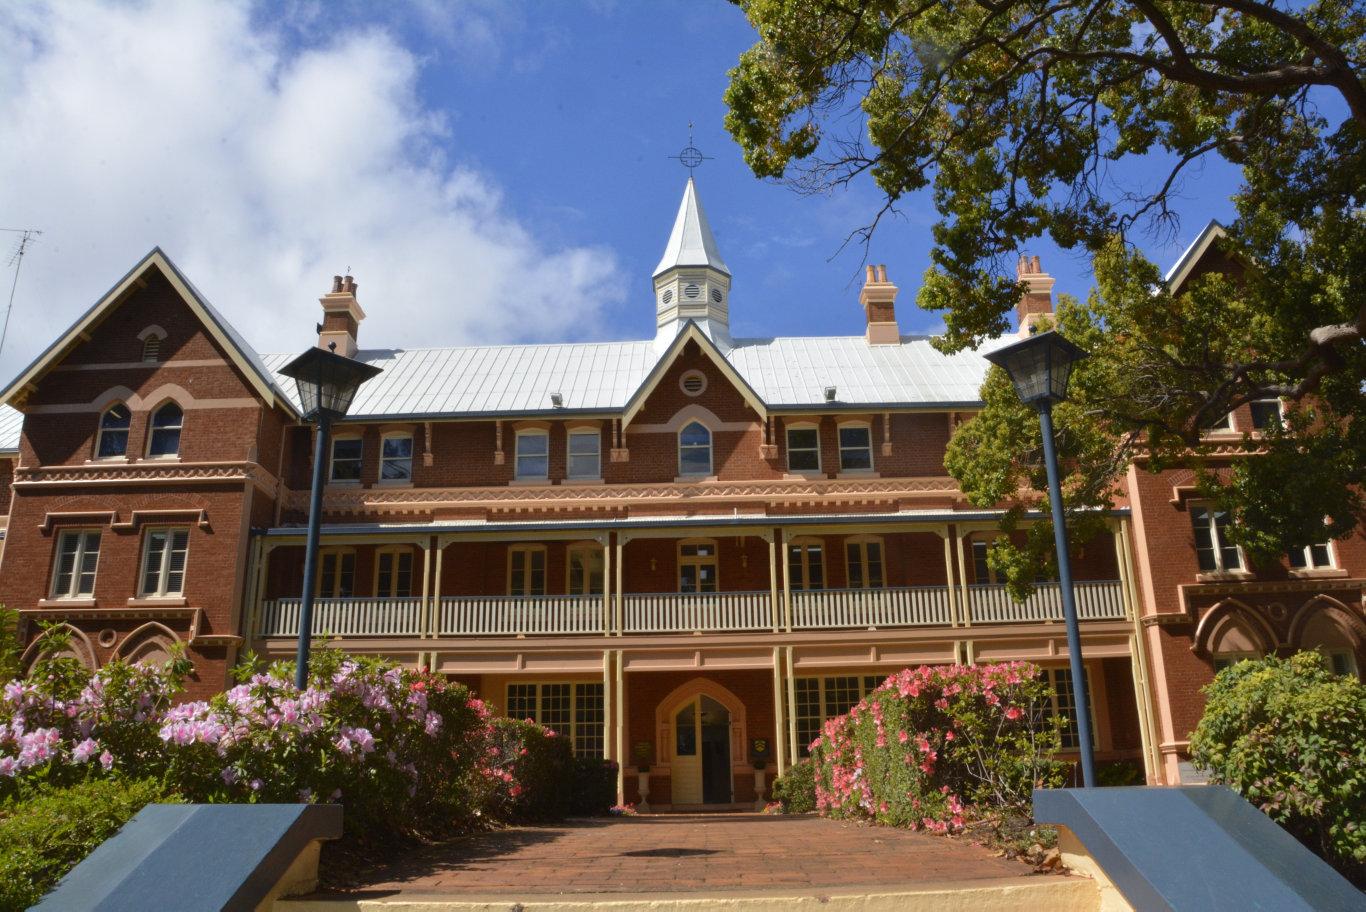 Toowoomba Grammar School.